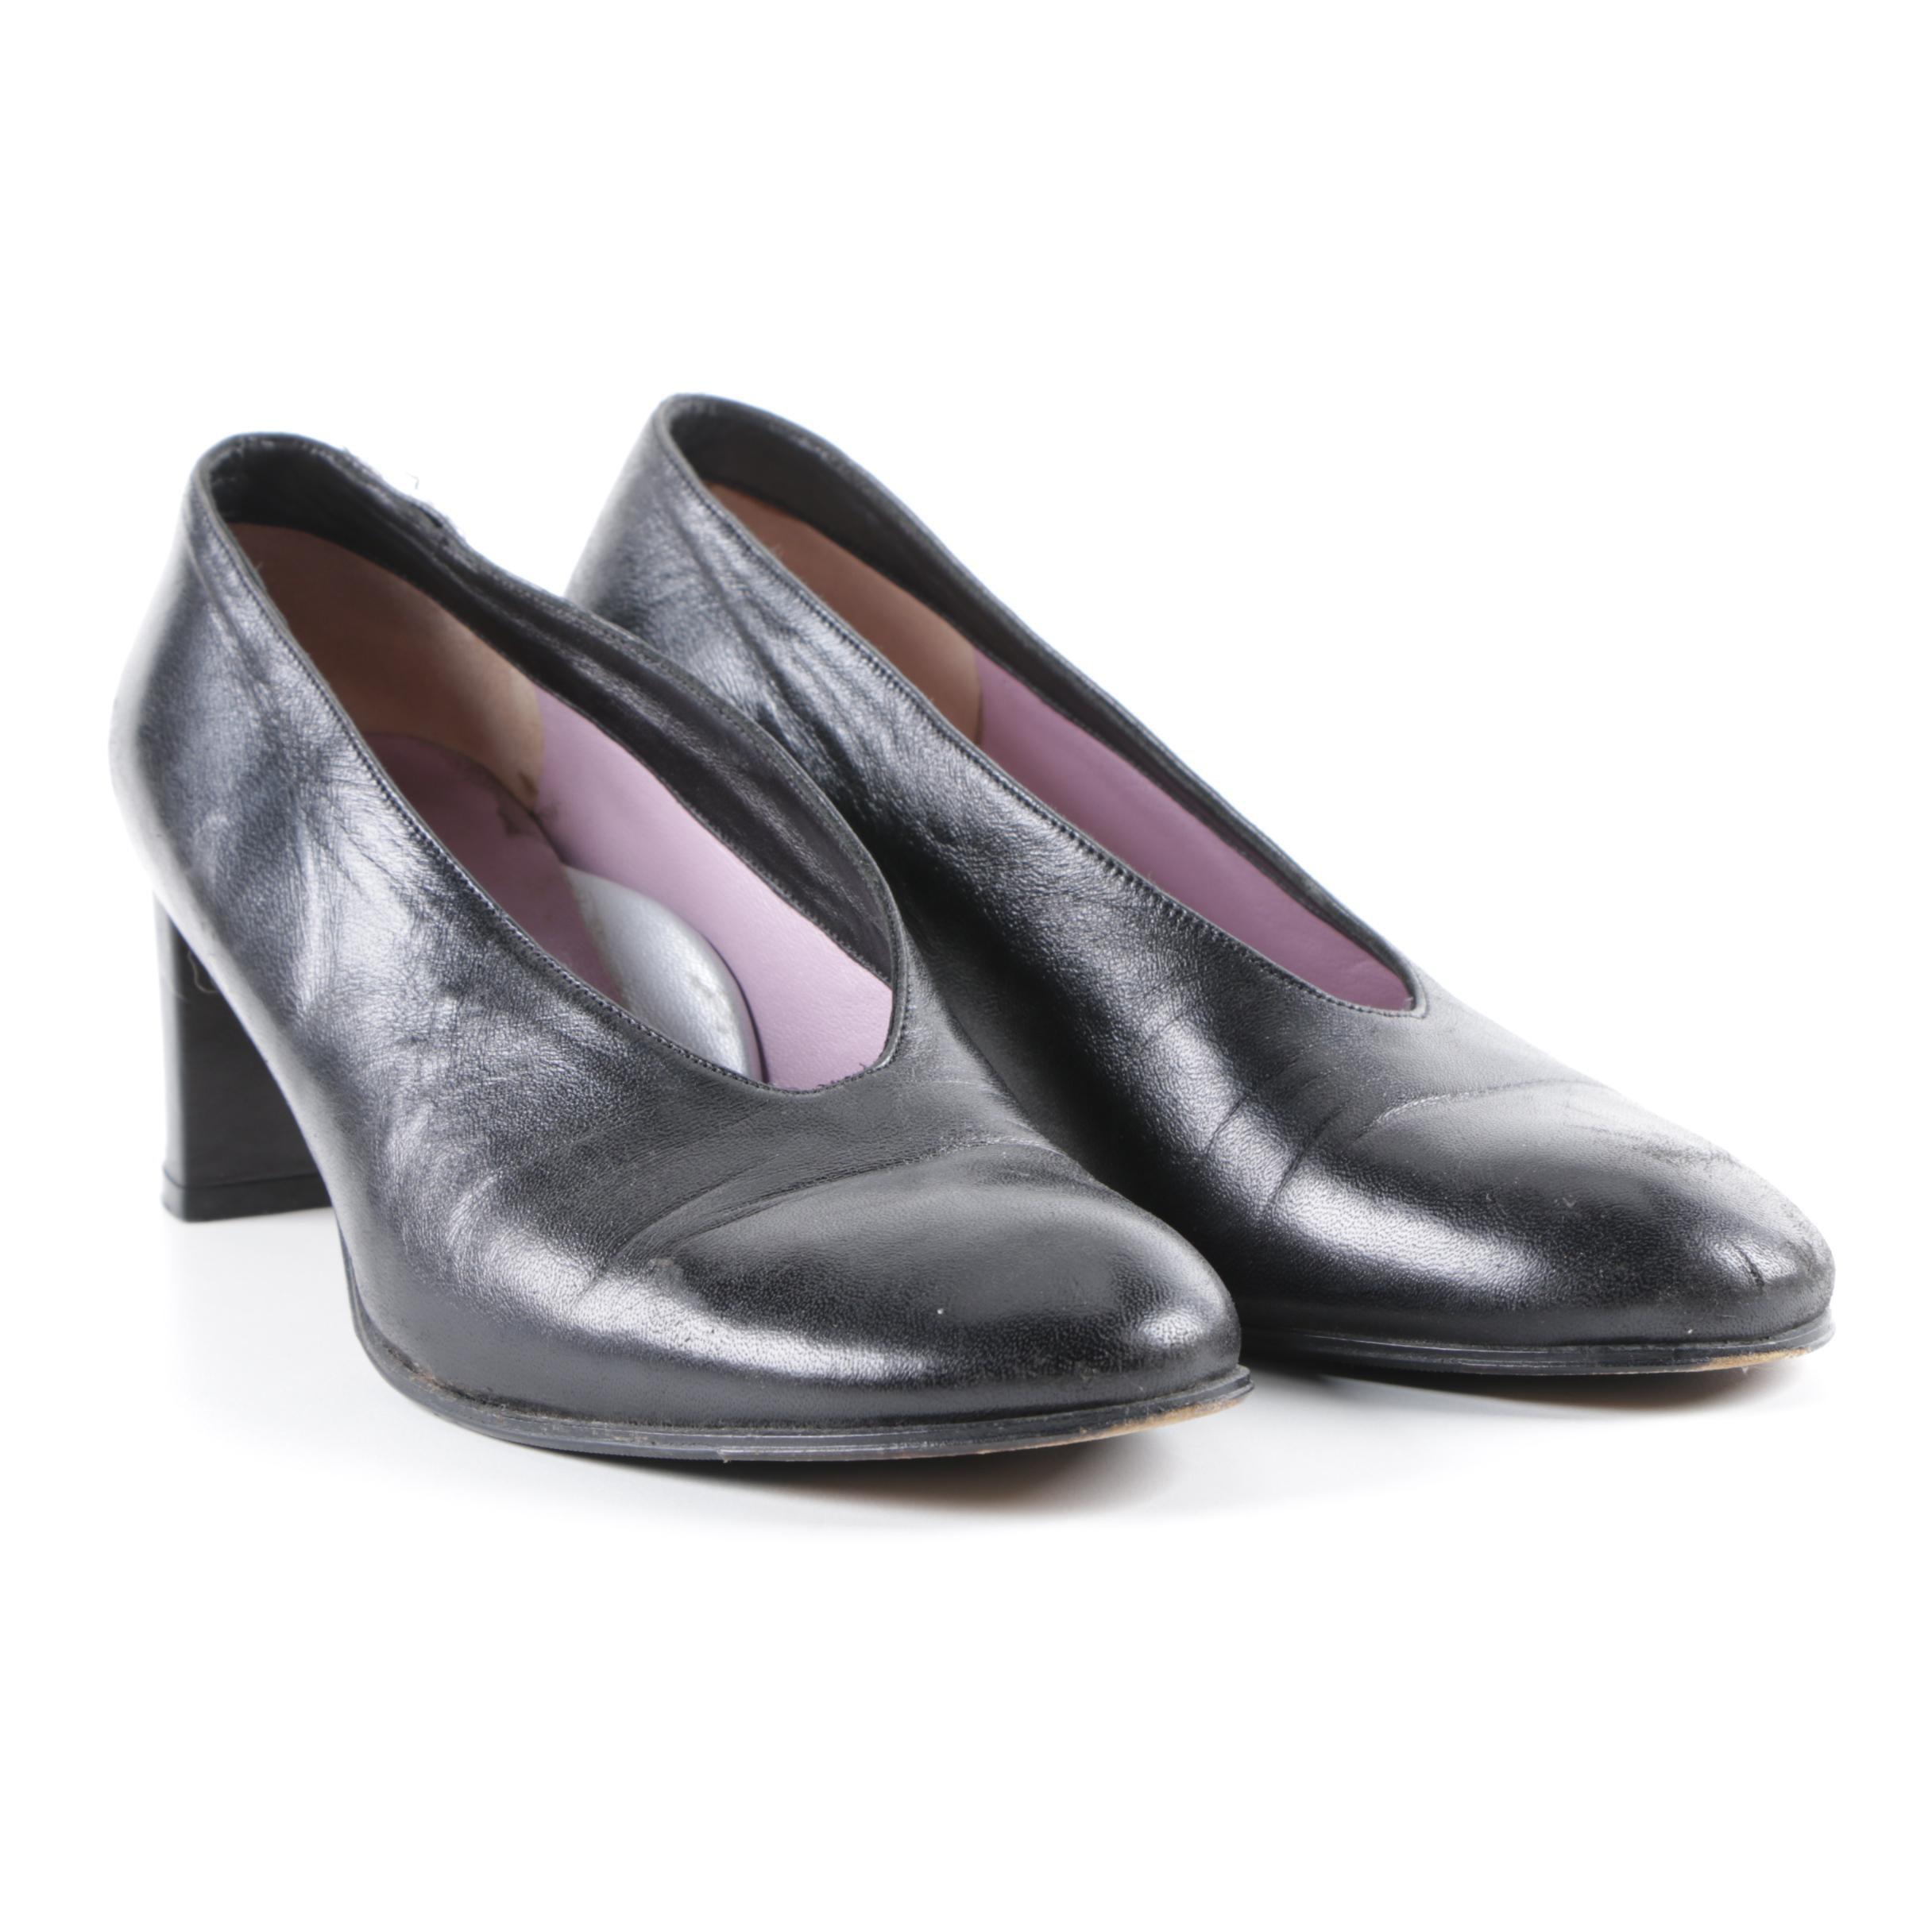 Taryn Rose Black Leather Pumps